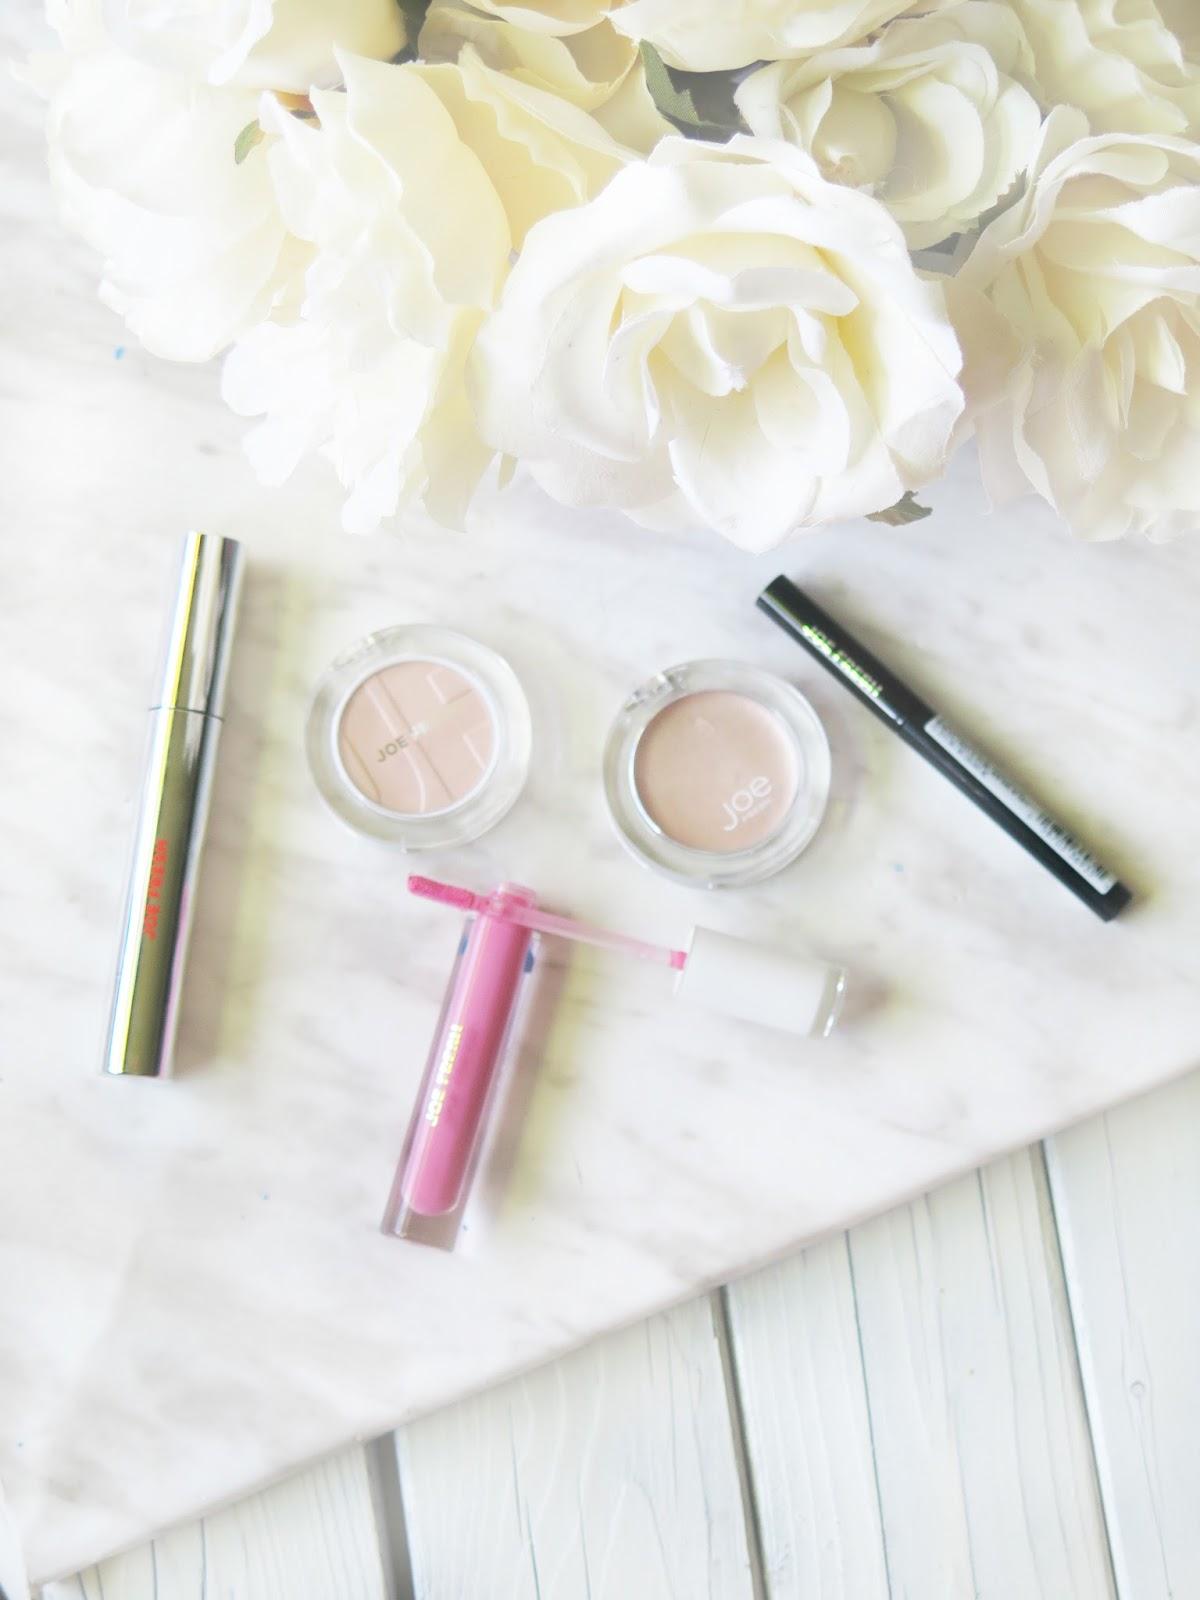 Fresh Is Best | Joe Fresh Beauty Now Available At Shoppers Drug Mart | labellesirene.ca